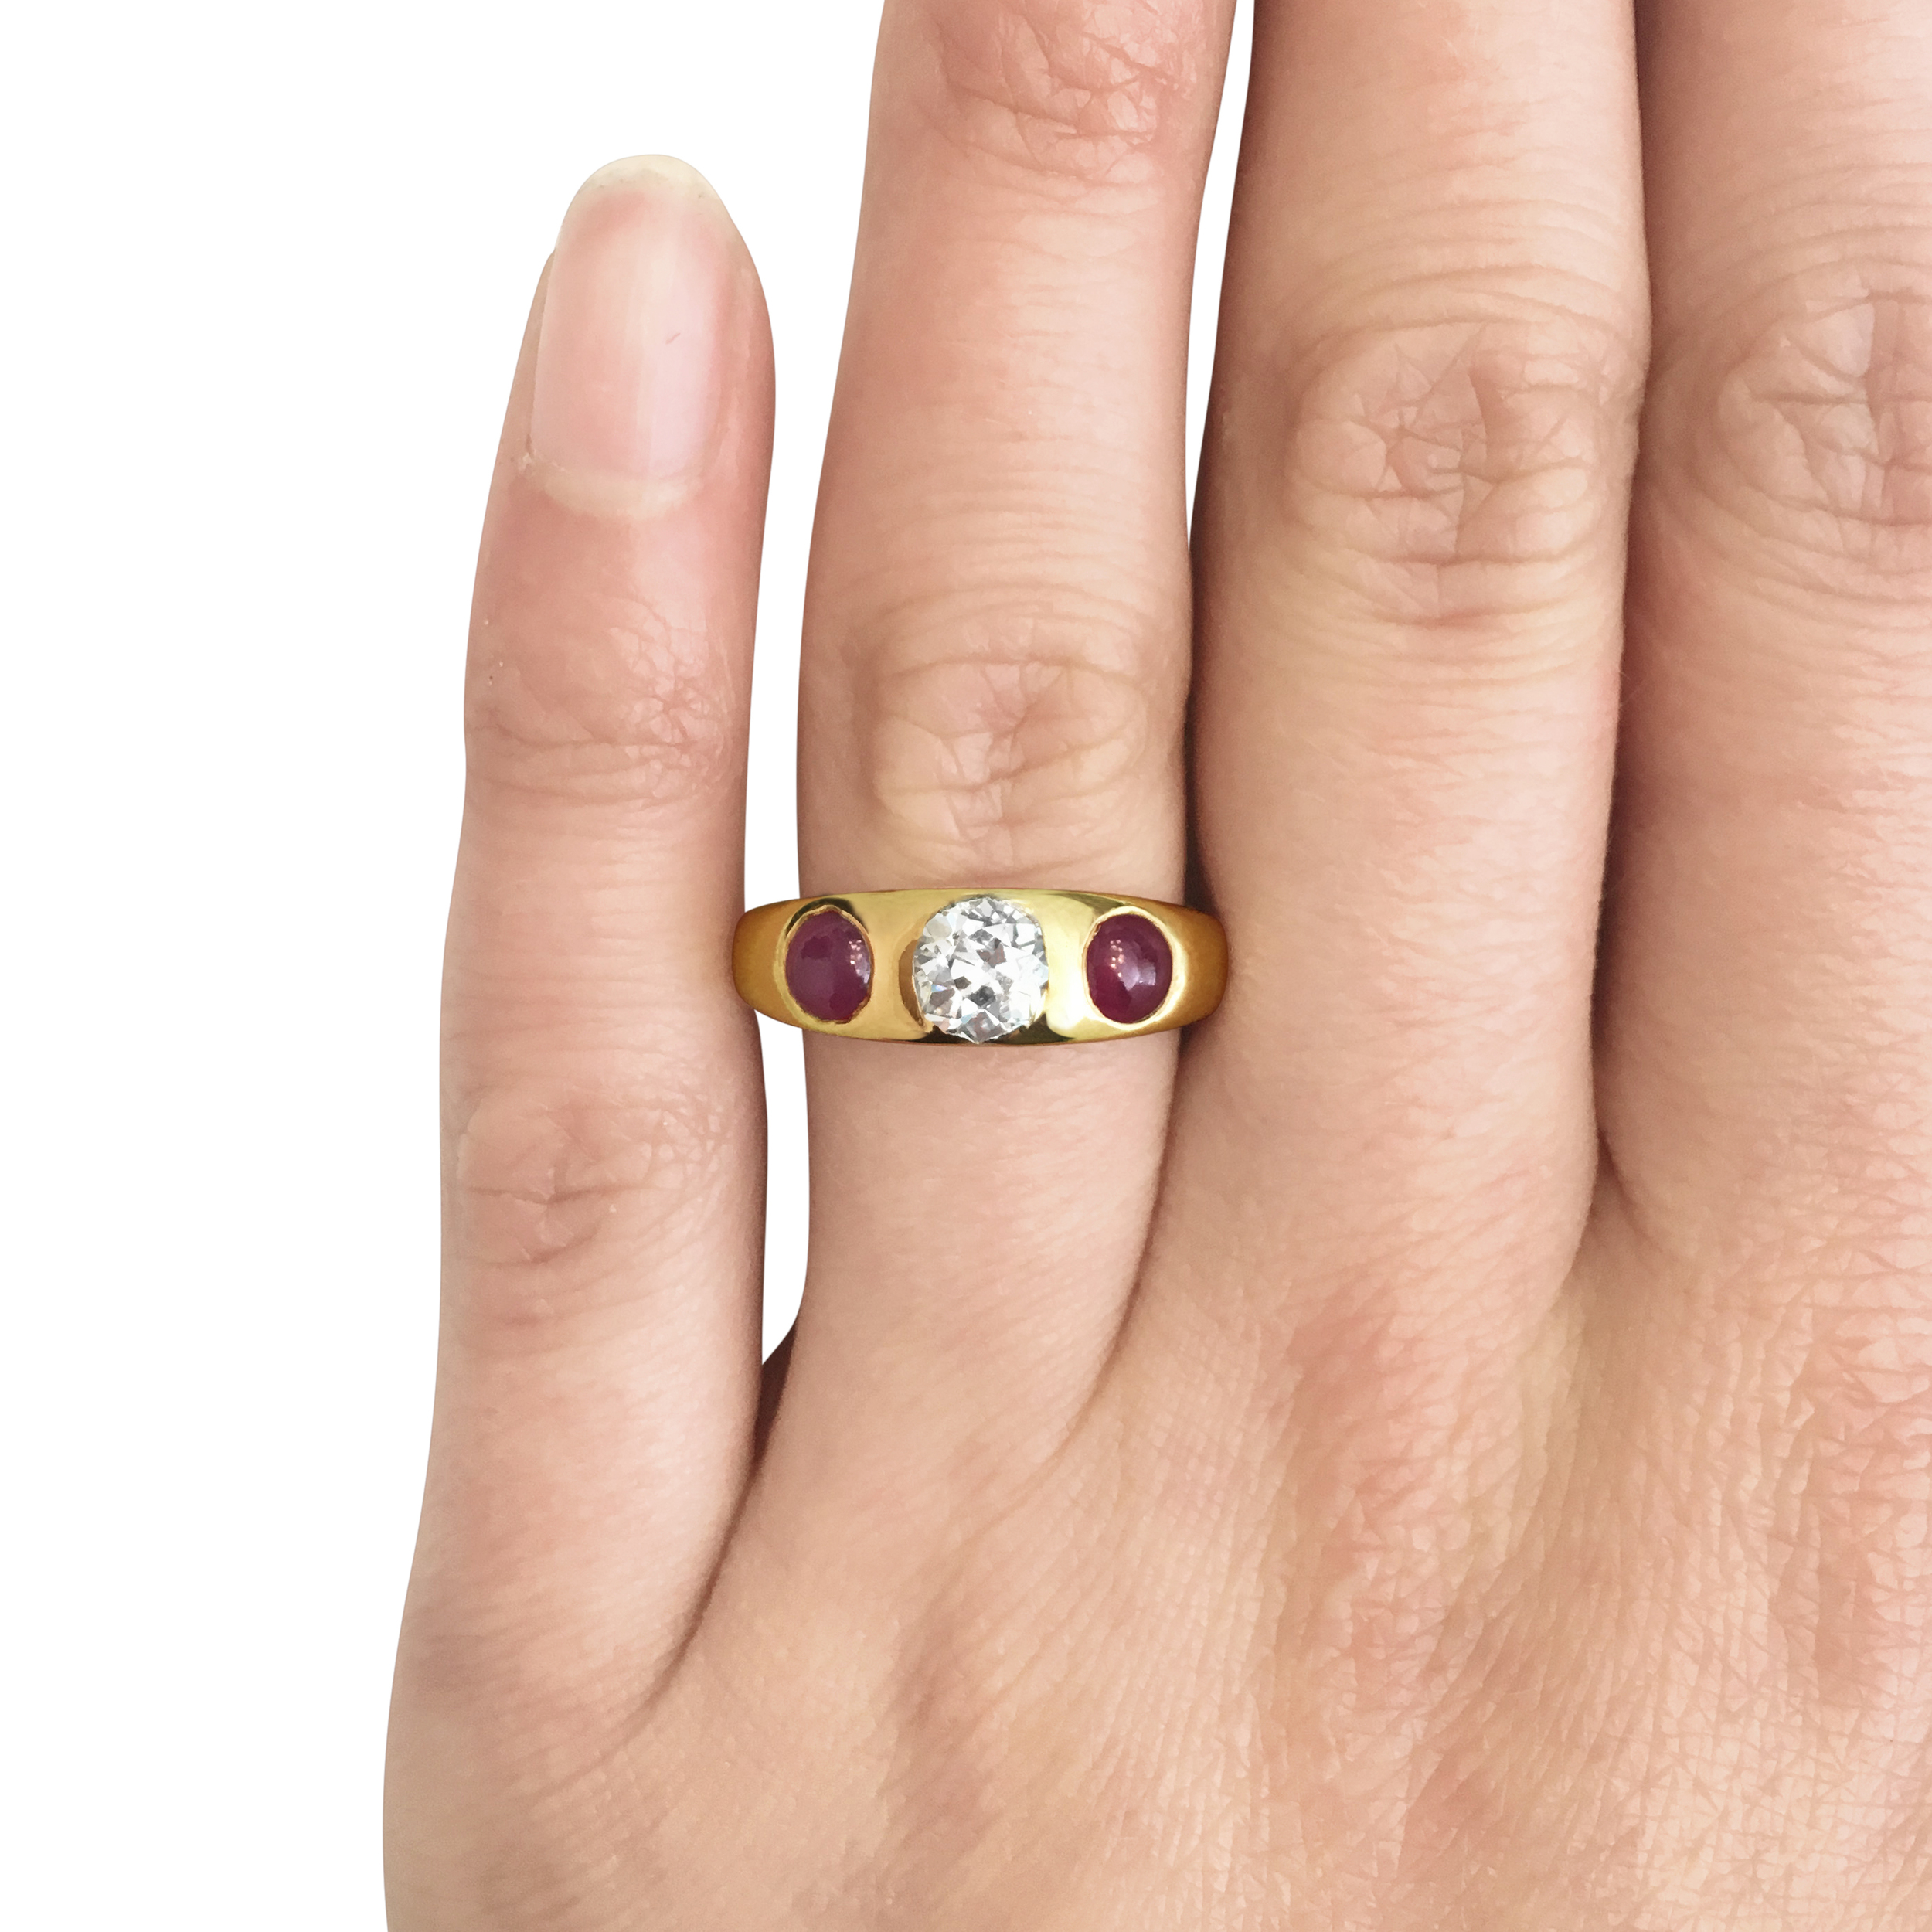 Antique diamond & ruby three-stone gypsy ring hand shot